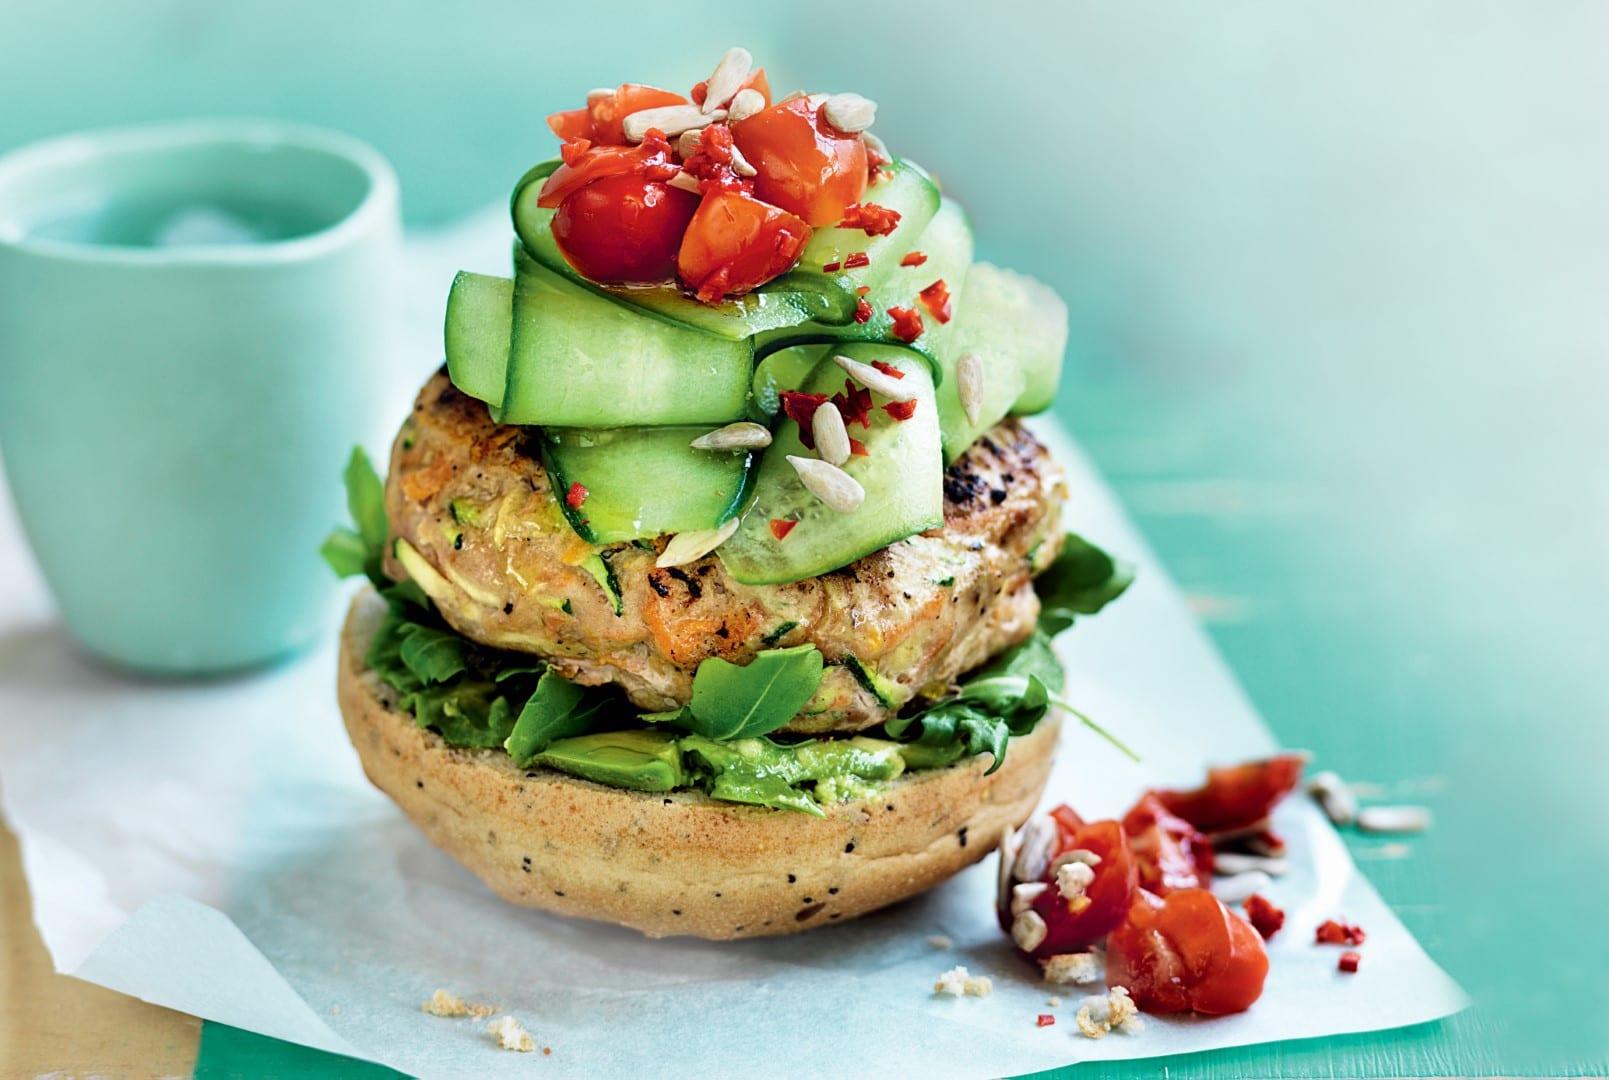 Healthy Burger Recipes Healthy Food Guide